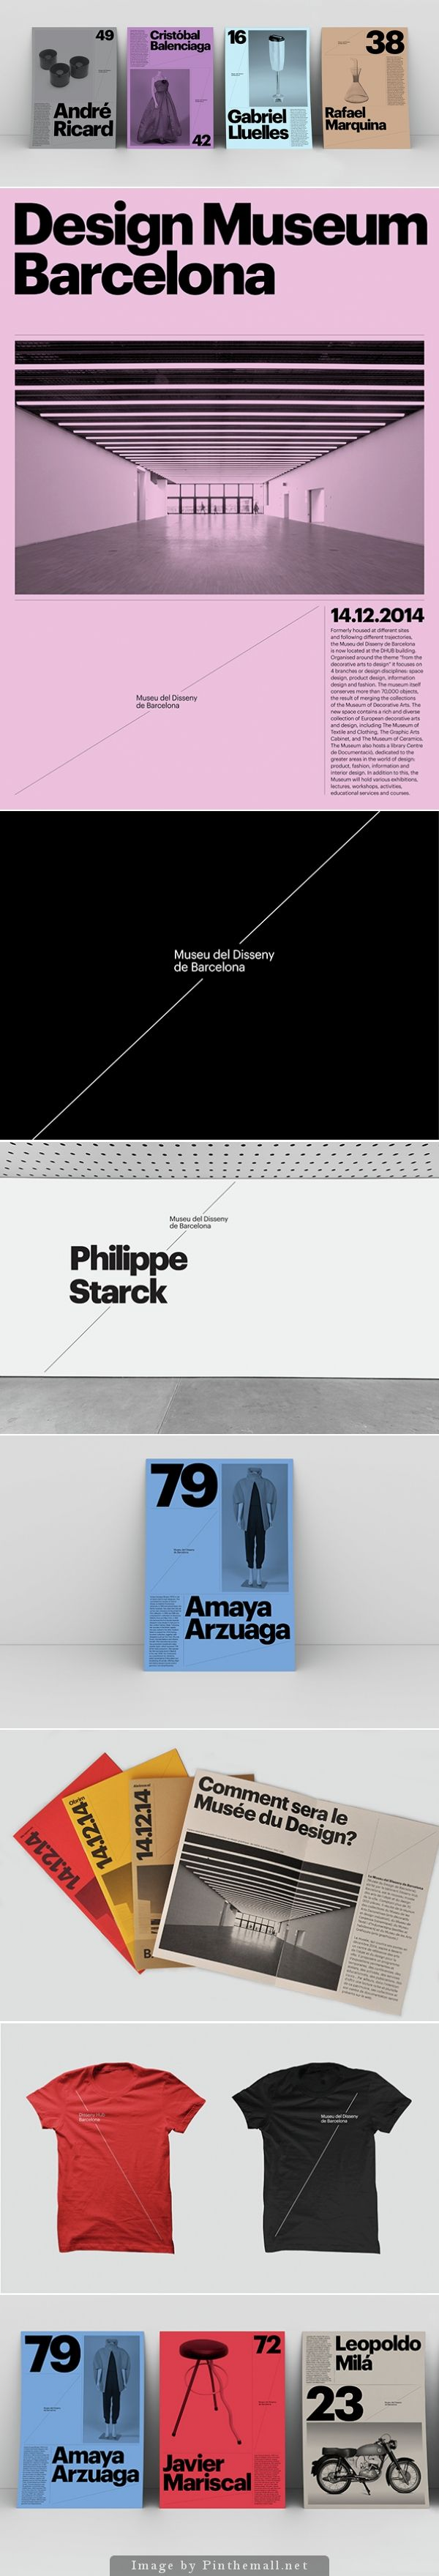 Atlas: Barcelona Design Museum identity